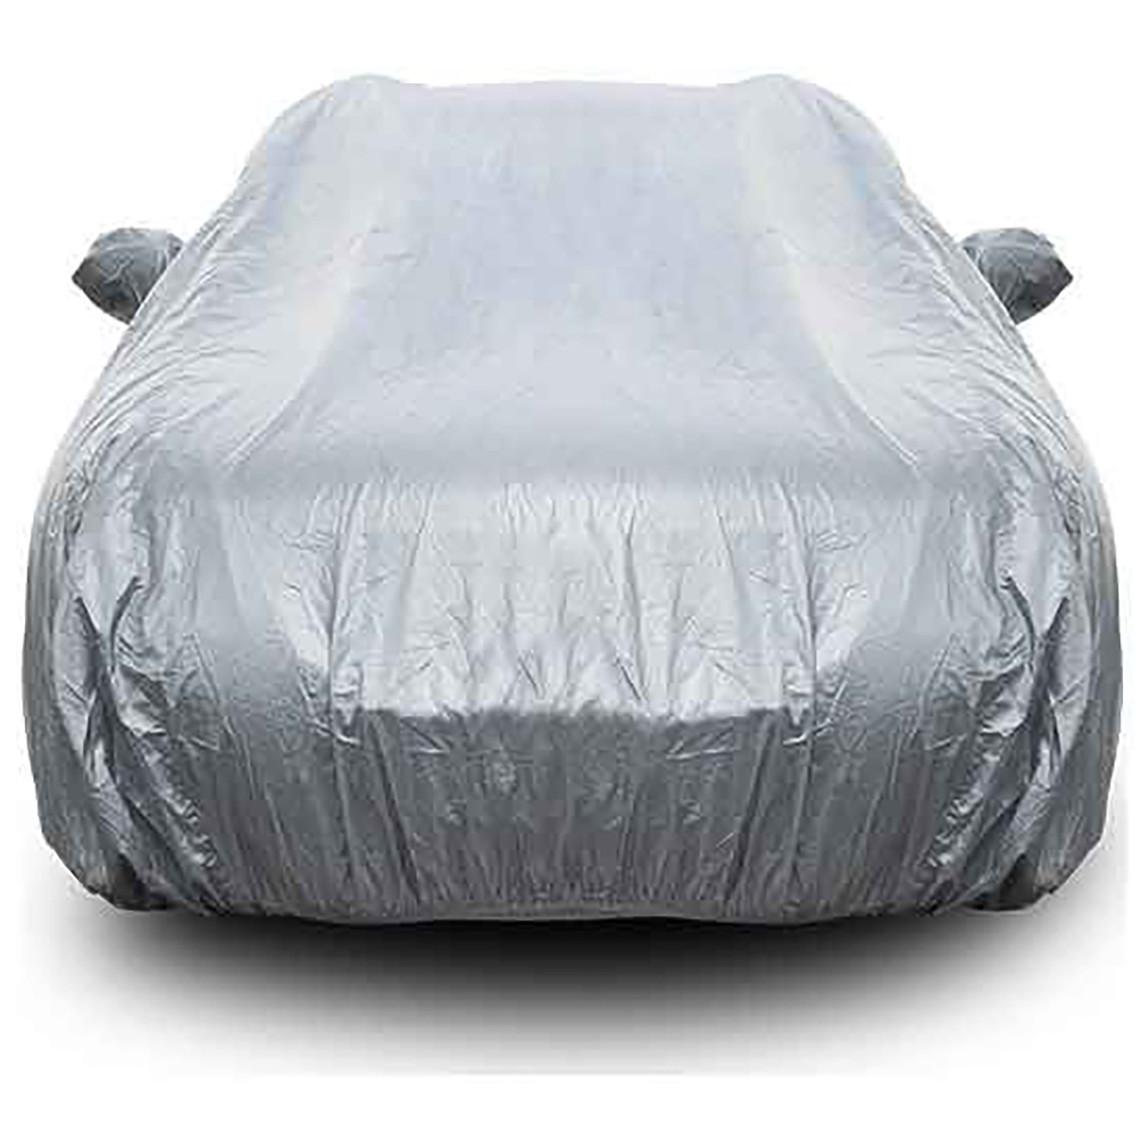 Oto Branda-L Sedan- Fluence- Bmw F10